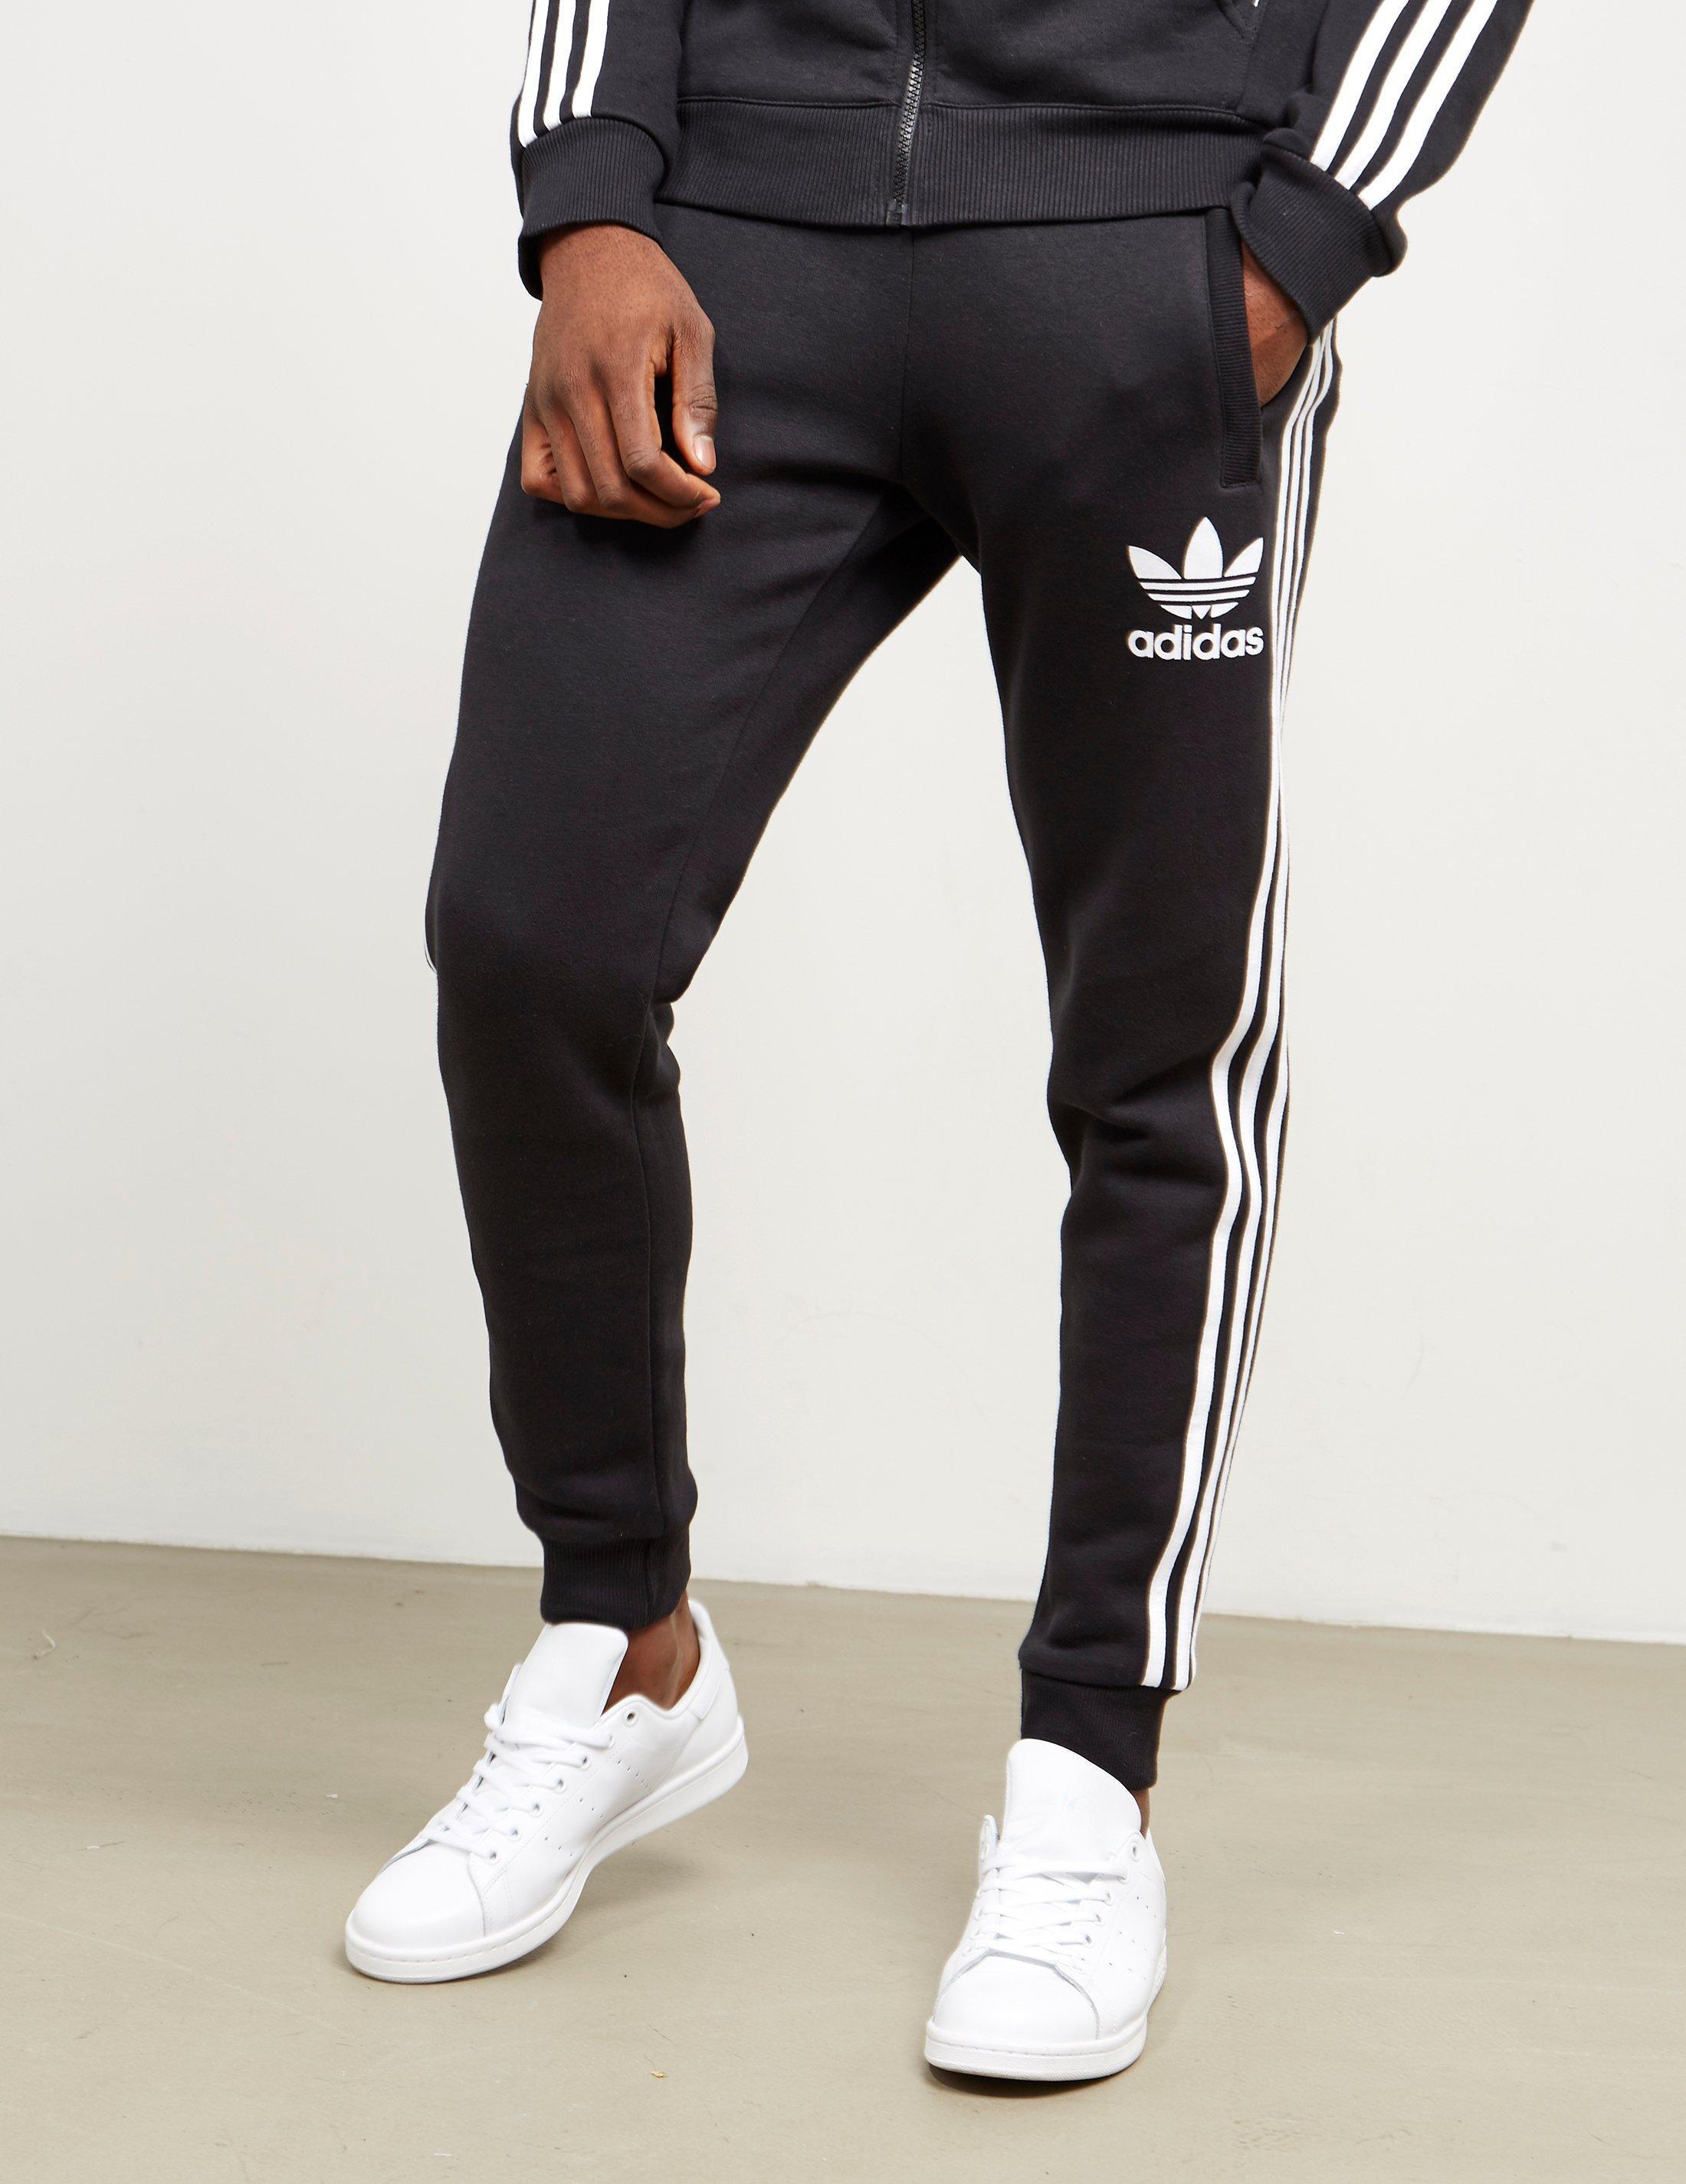 Adidas Originals Mens California Cuffed Track Pants Blackwhite for men